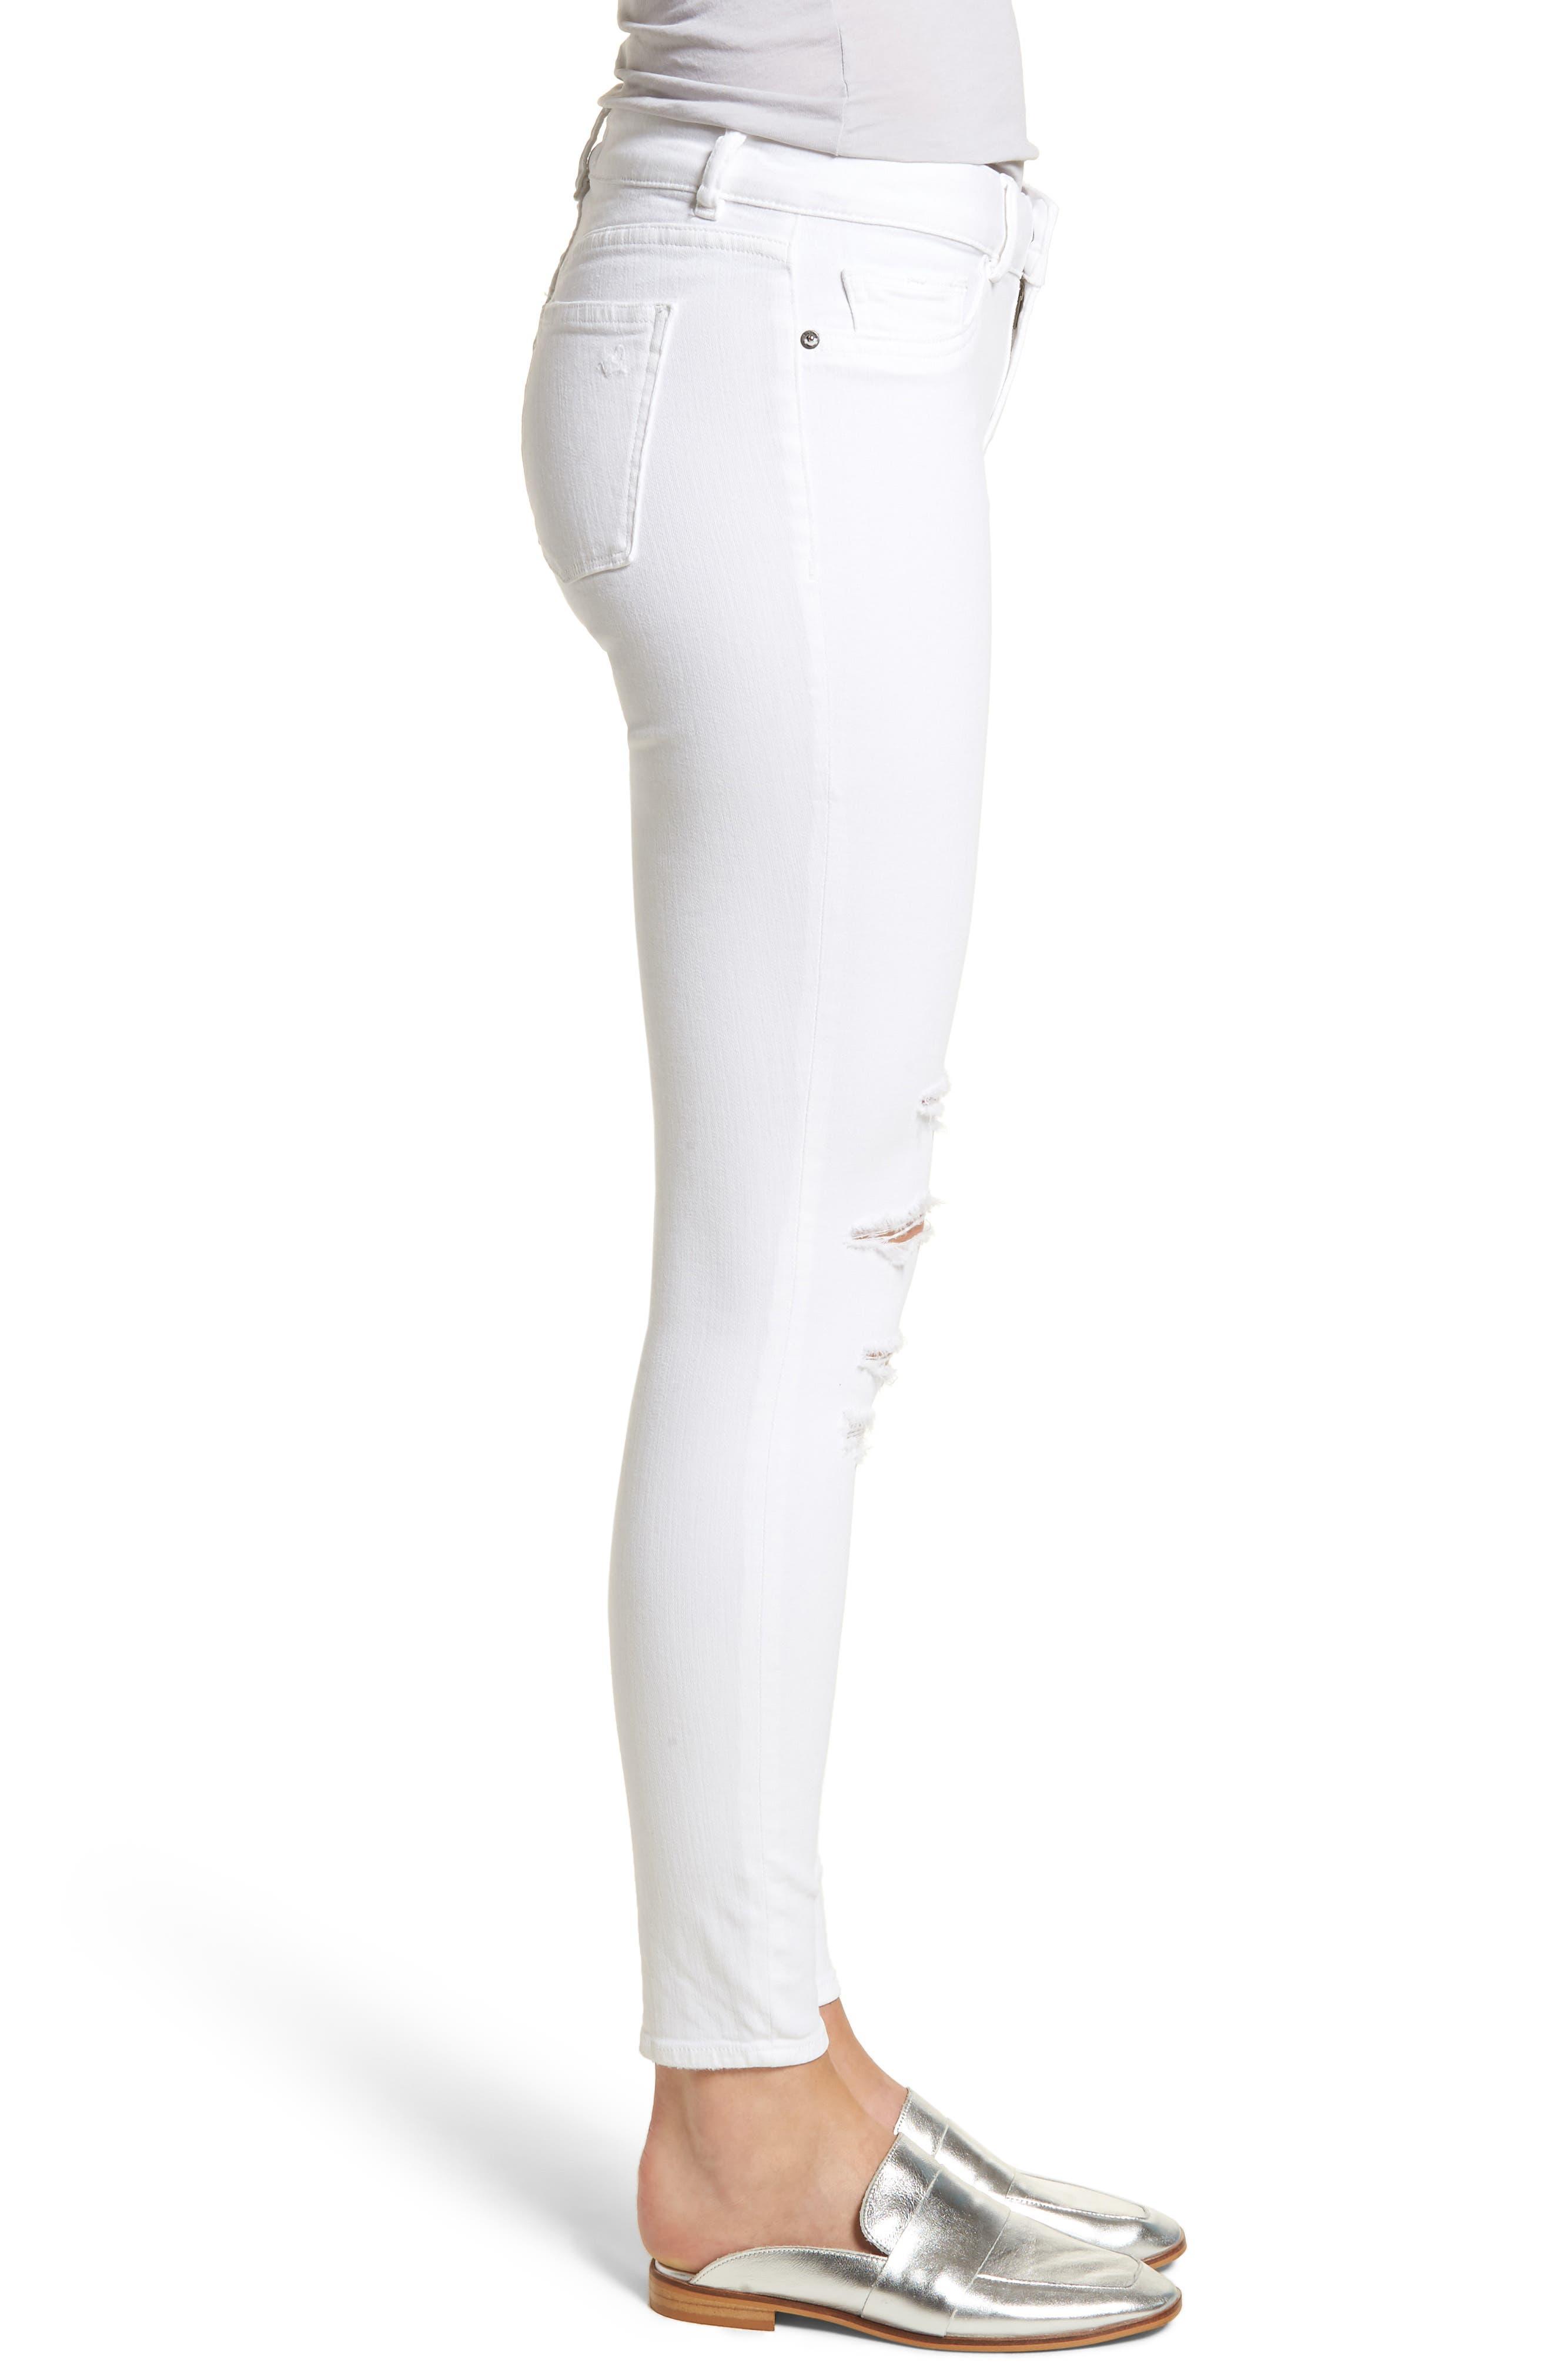 Emma Power Legging Jeans,                             Alternate thumbnail 3, color,                             Dawson